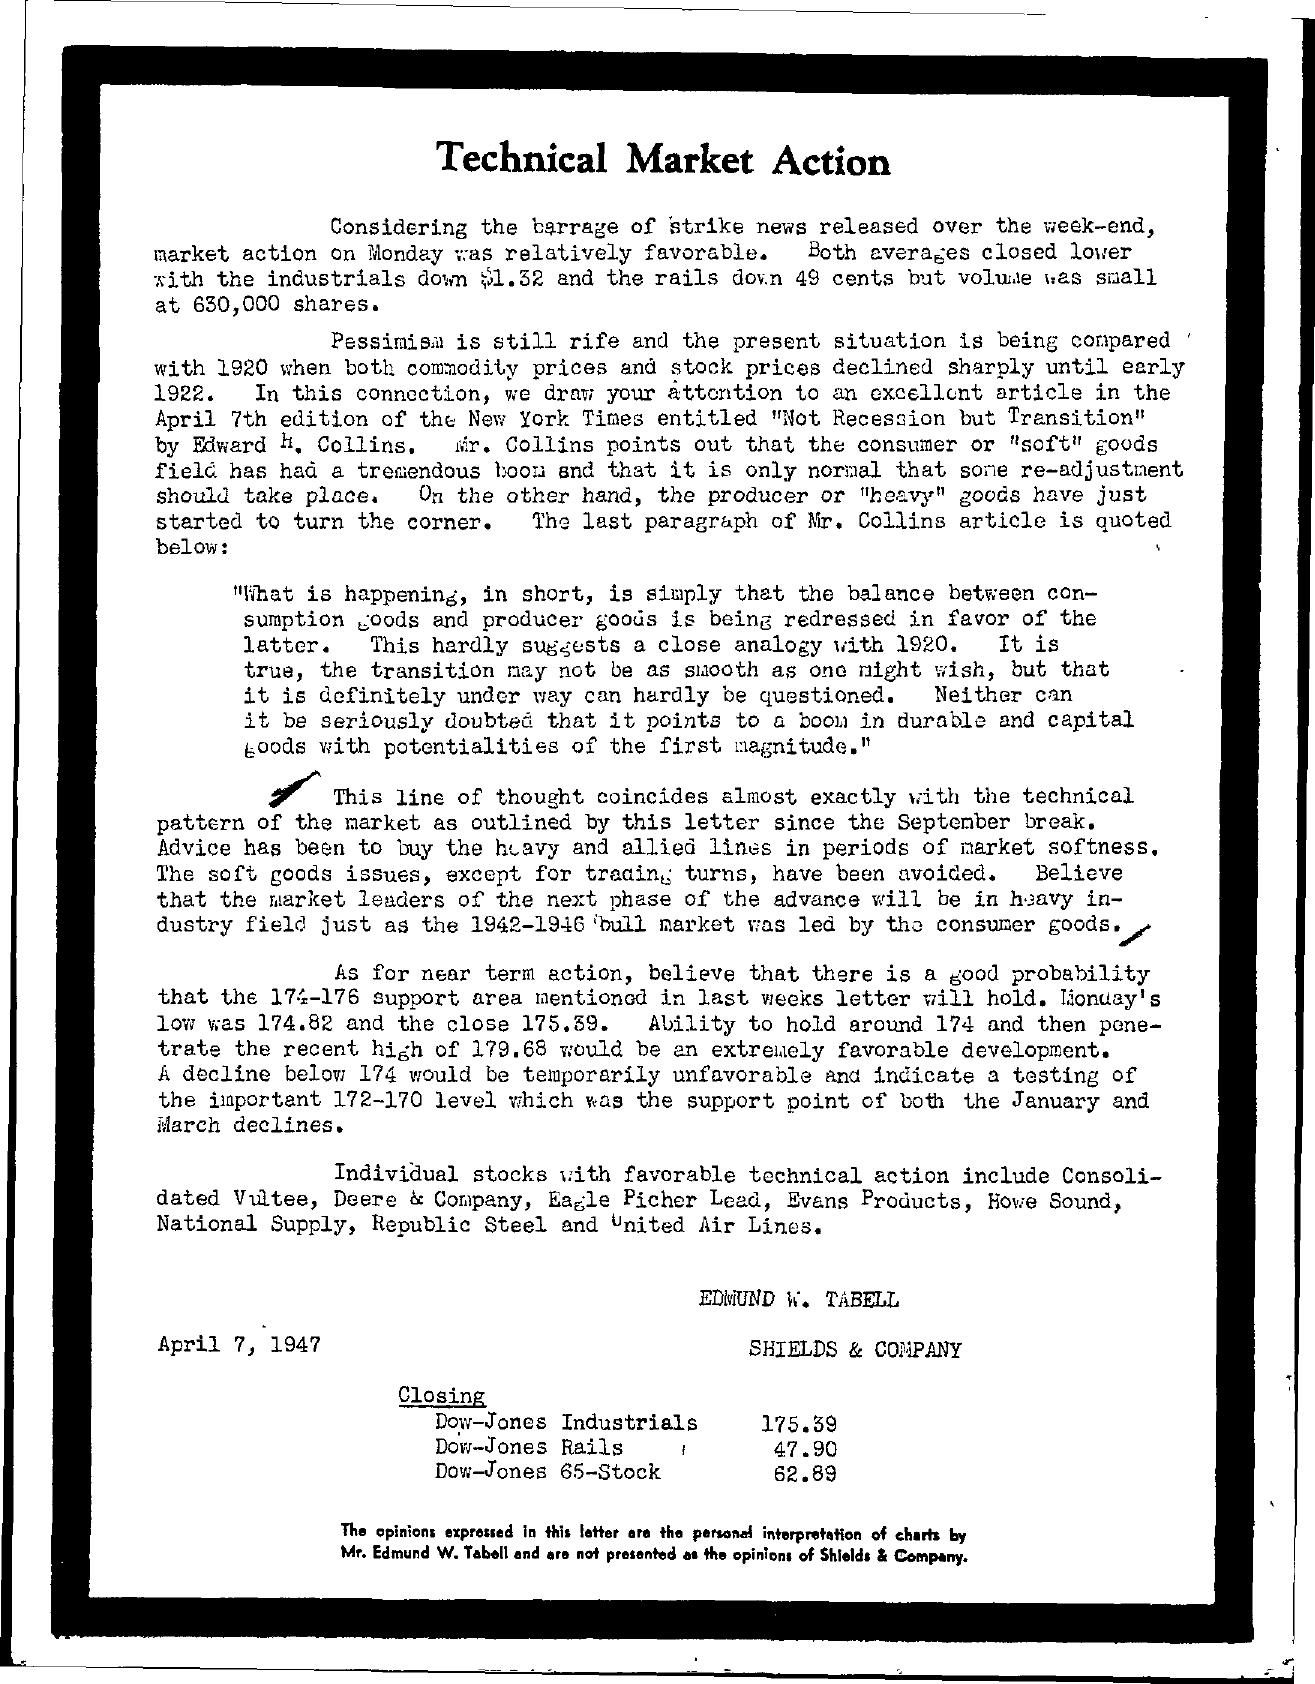 Tabell's Market Letter - April 07, 1947